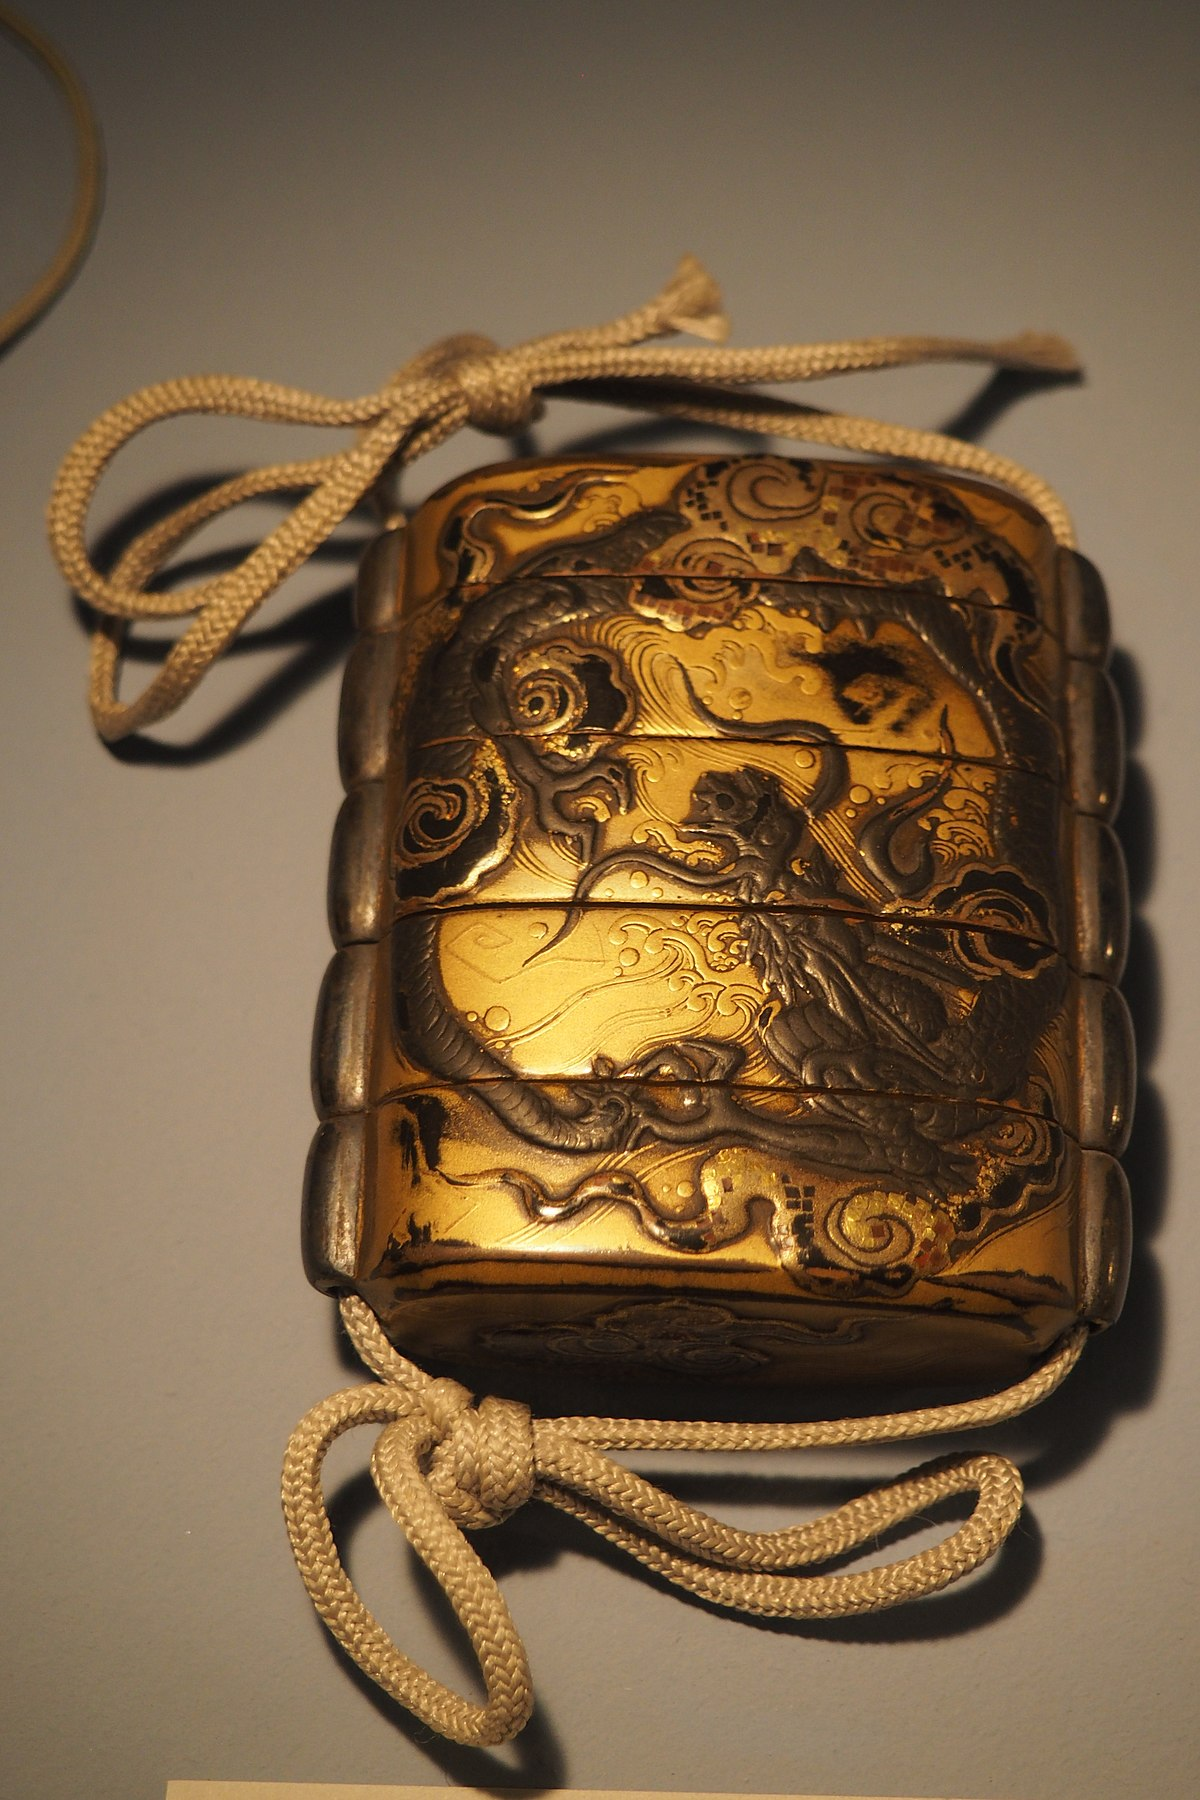 Japanese lacquerware - Wikipedia